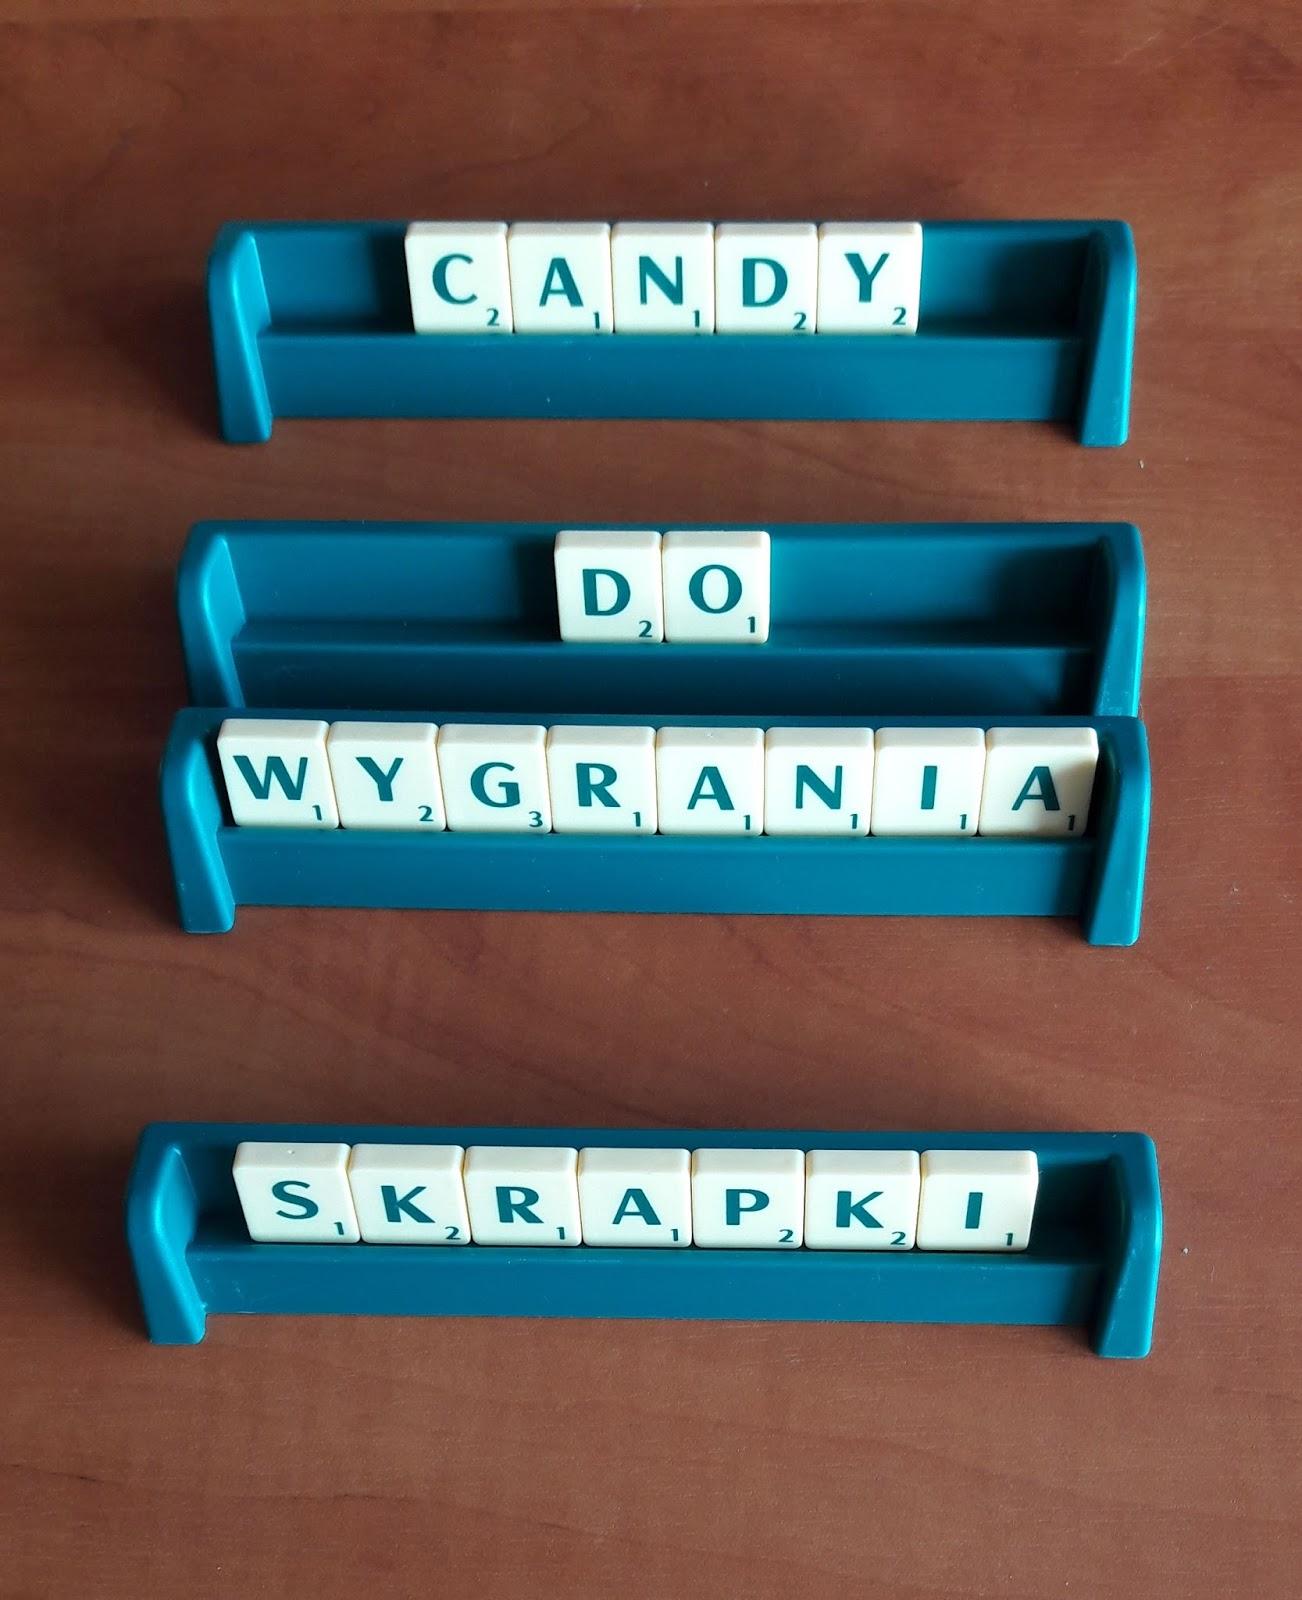 Candy ze scrapkami